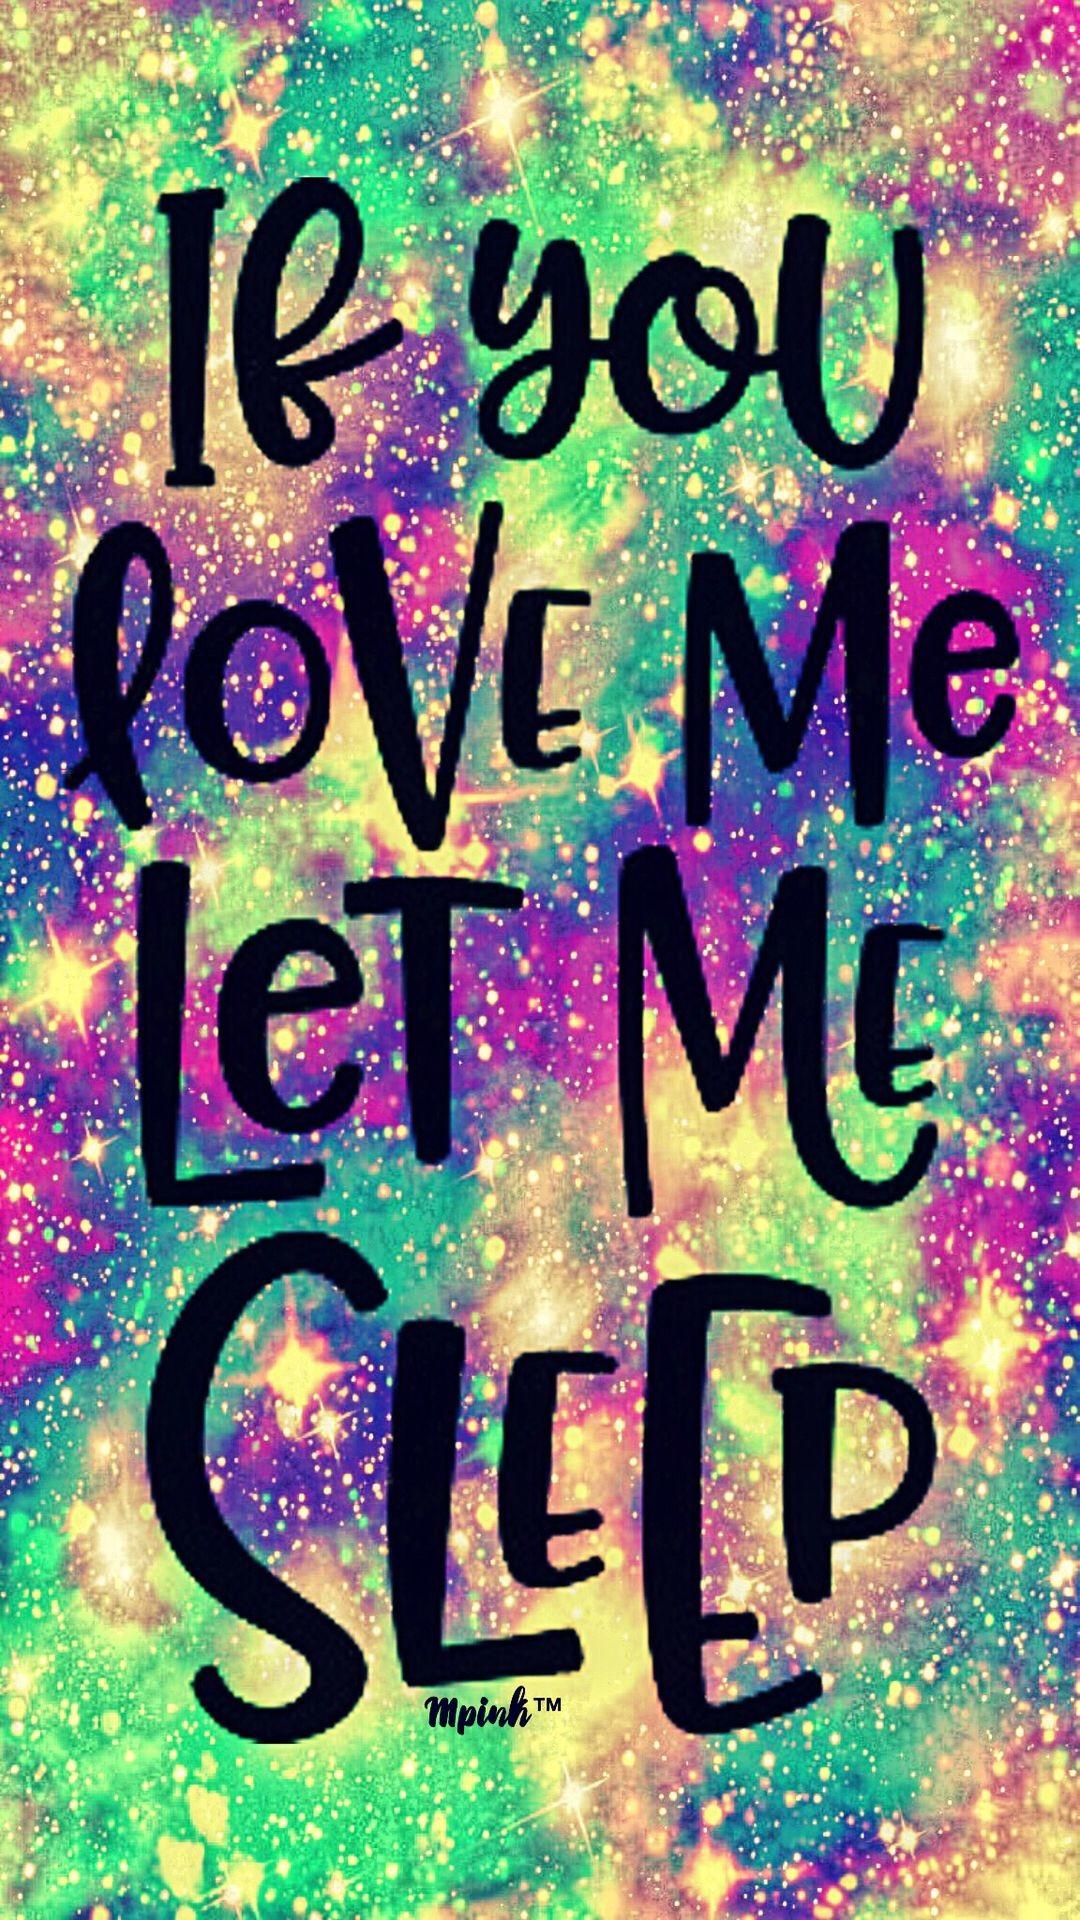 If You Love Me Let Me Sleep Galaxy Wallpaper - Quotes If You Love Me Let Me Sleep - HD Wallpaper